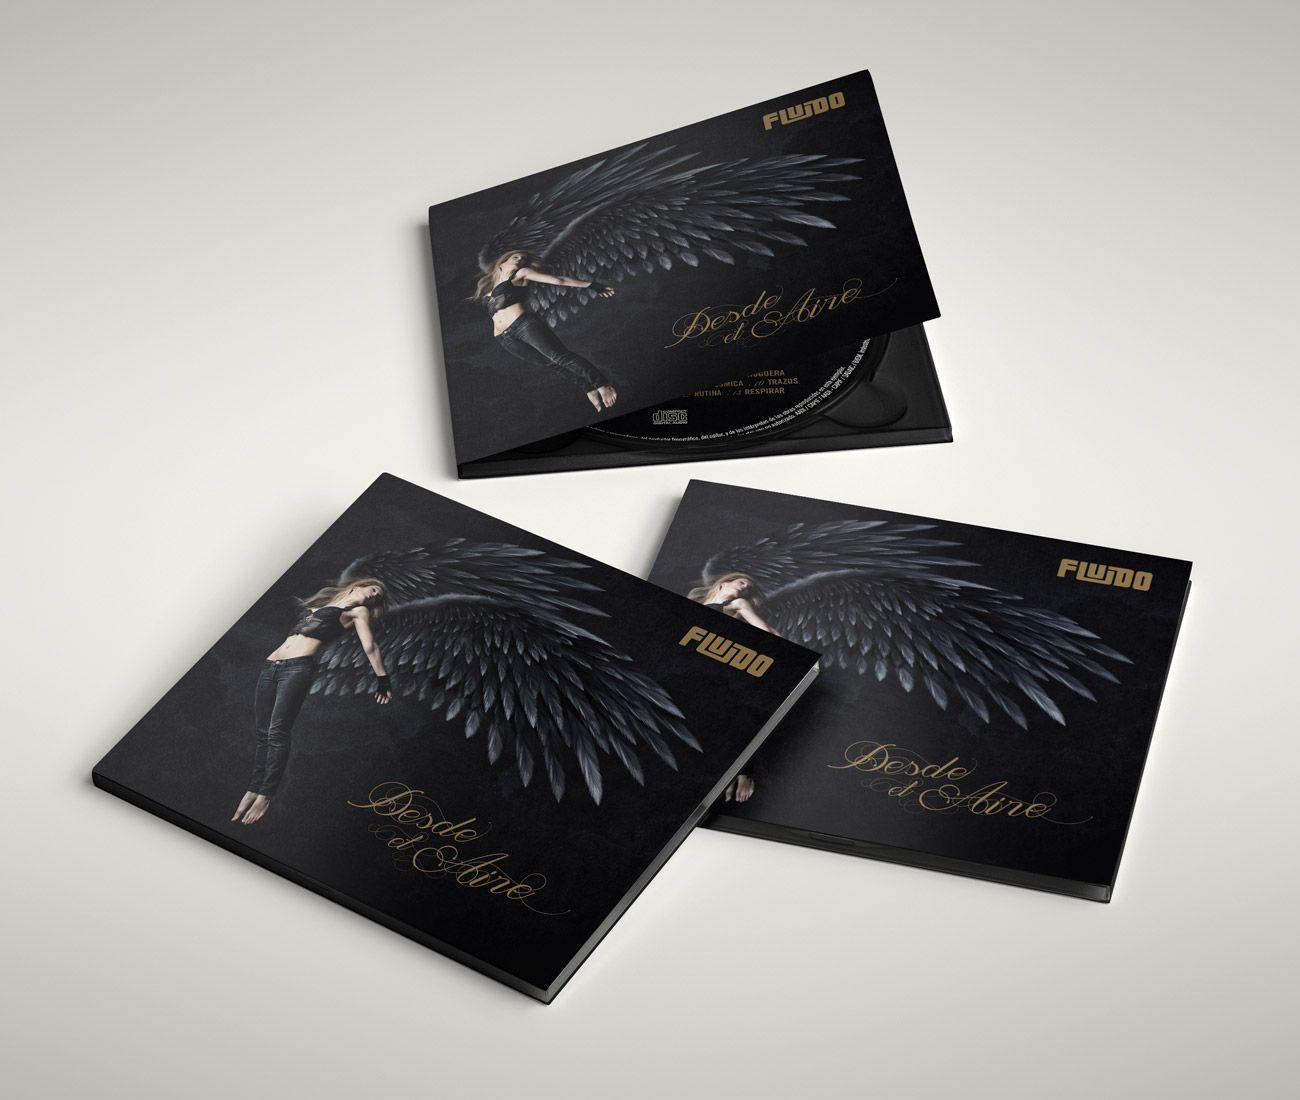 Fluido Desde el Aire Digipack Design Inside CD